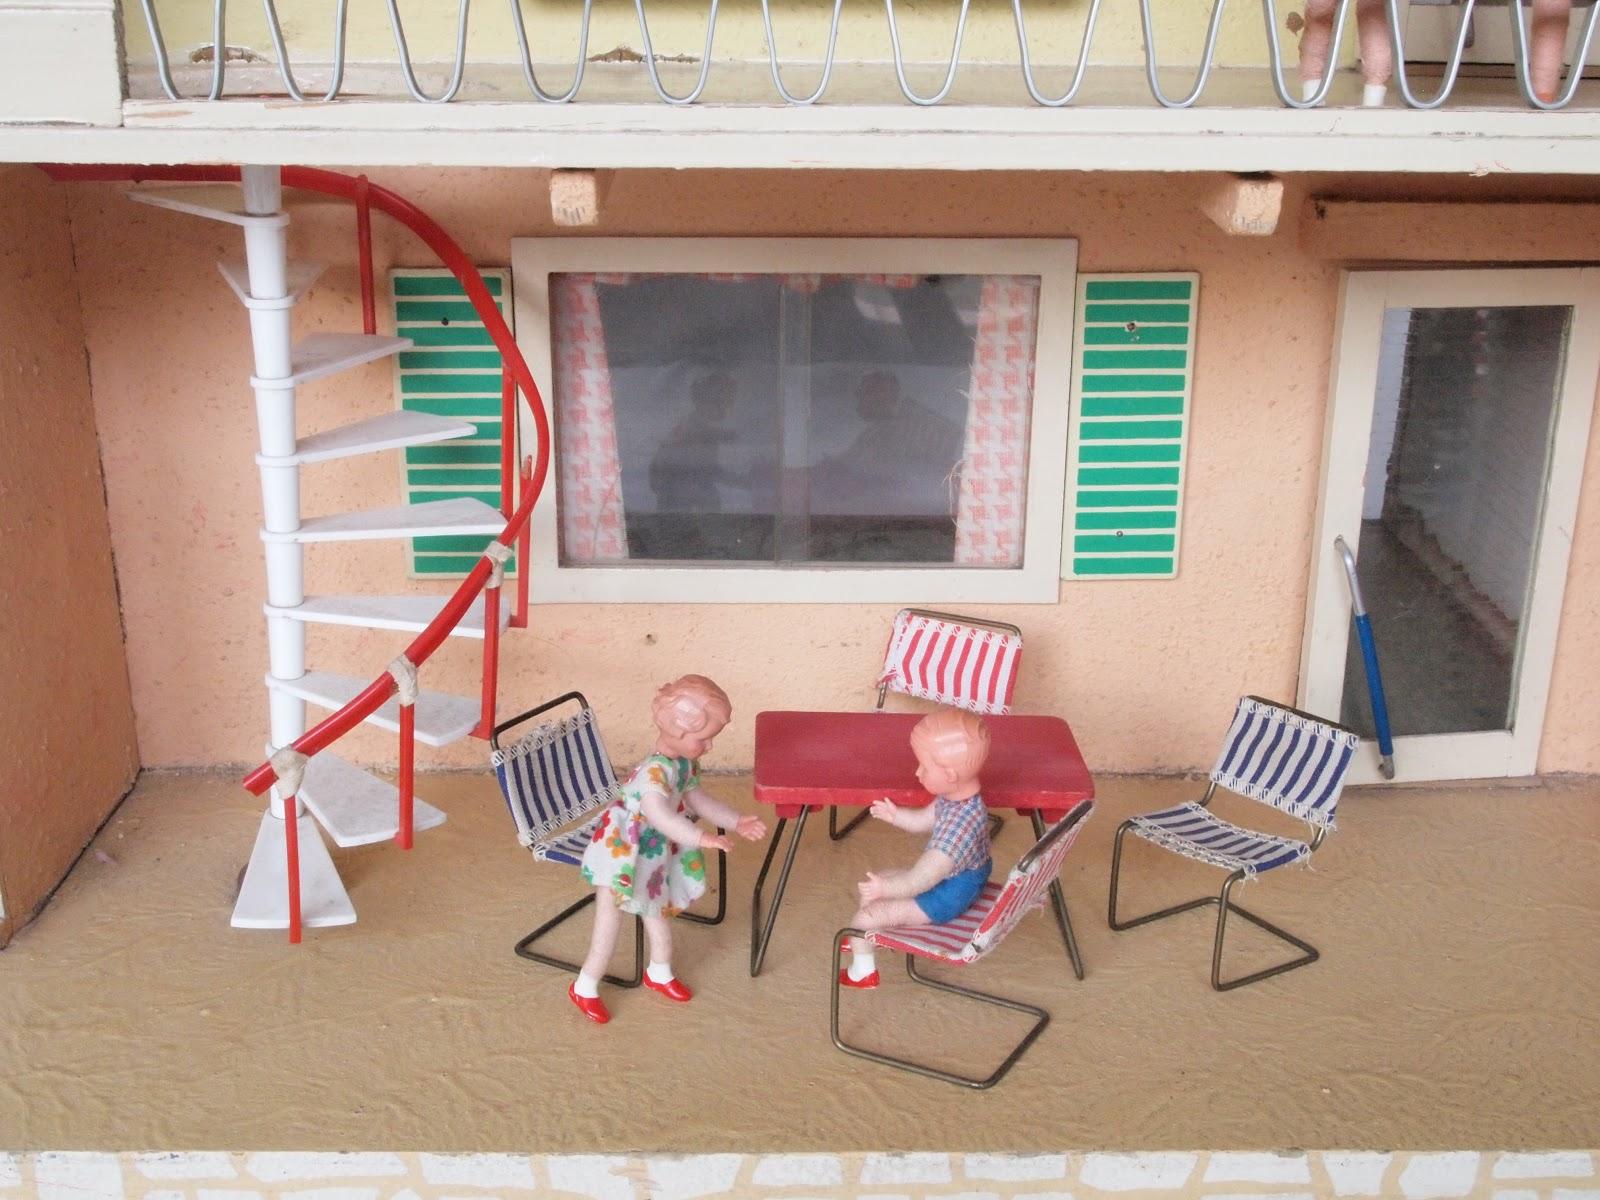 diepuppenstubensammlerin puppenhaus 1966 gottschalk dolls house. Black Bedroom Furniture Sets. Home Design Ideas